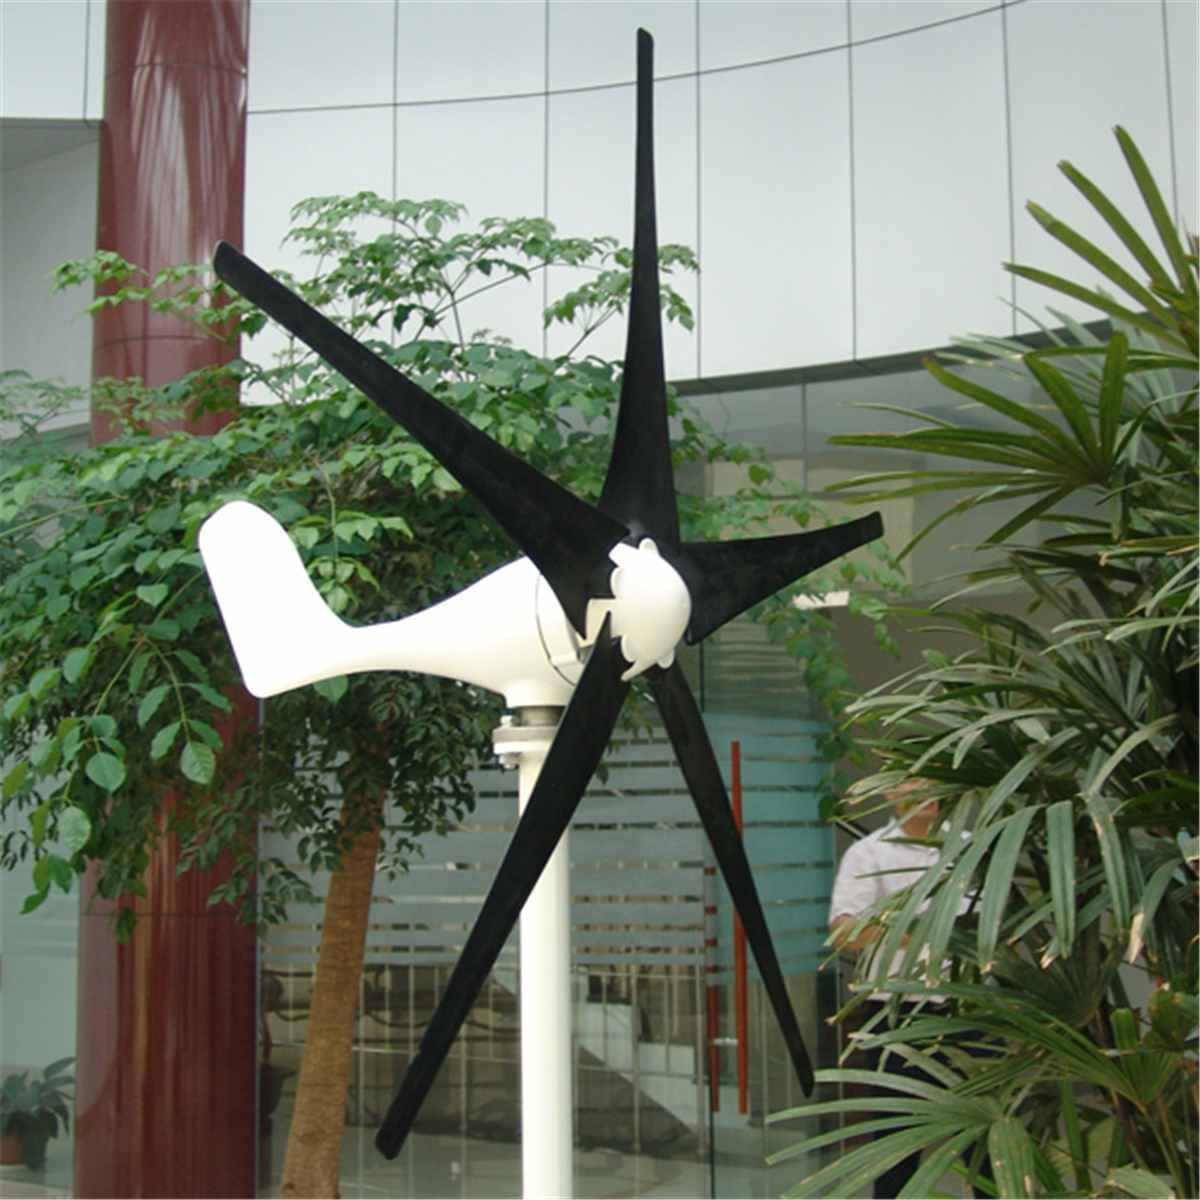 Alternative Energy Generator 5 Blades DC 12/24V 100W Wind TurbineGenerator With Windmill Charge Controller Electrical MachineAlternative Energy Generator 5 Blades DC 12/24V 100W Wind TurbineGenerator With Windmill Charge Controller Electrical Machine